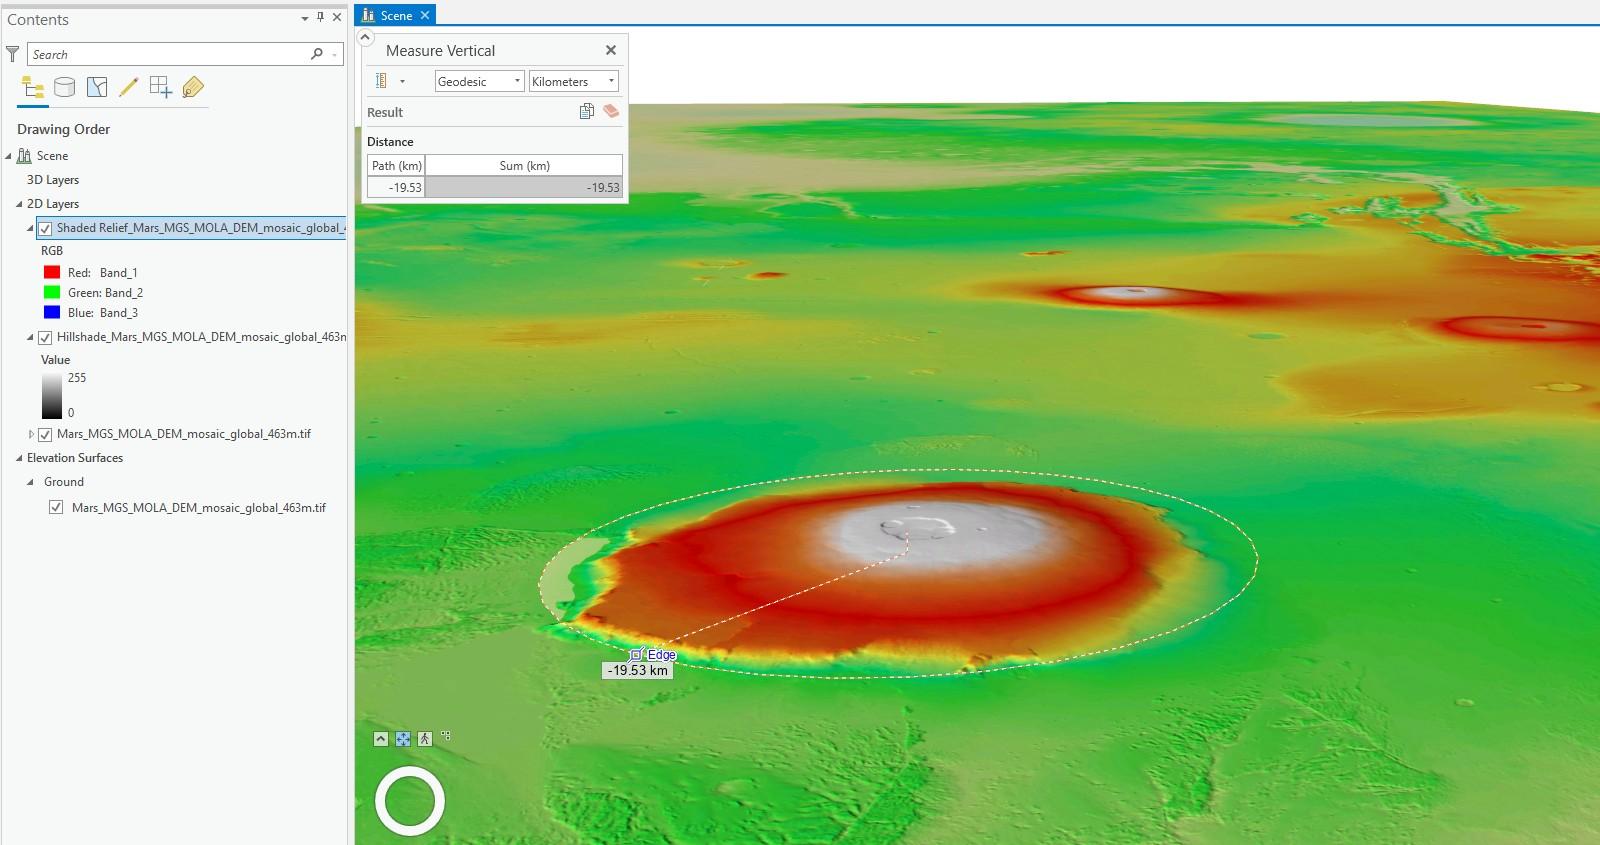 Marte em 3D no ArcGIS PRO